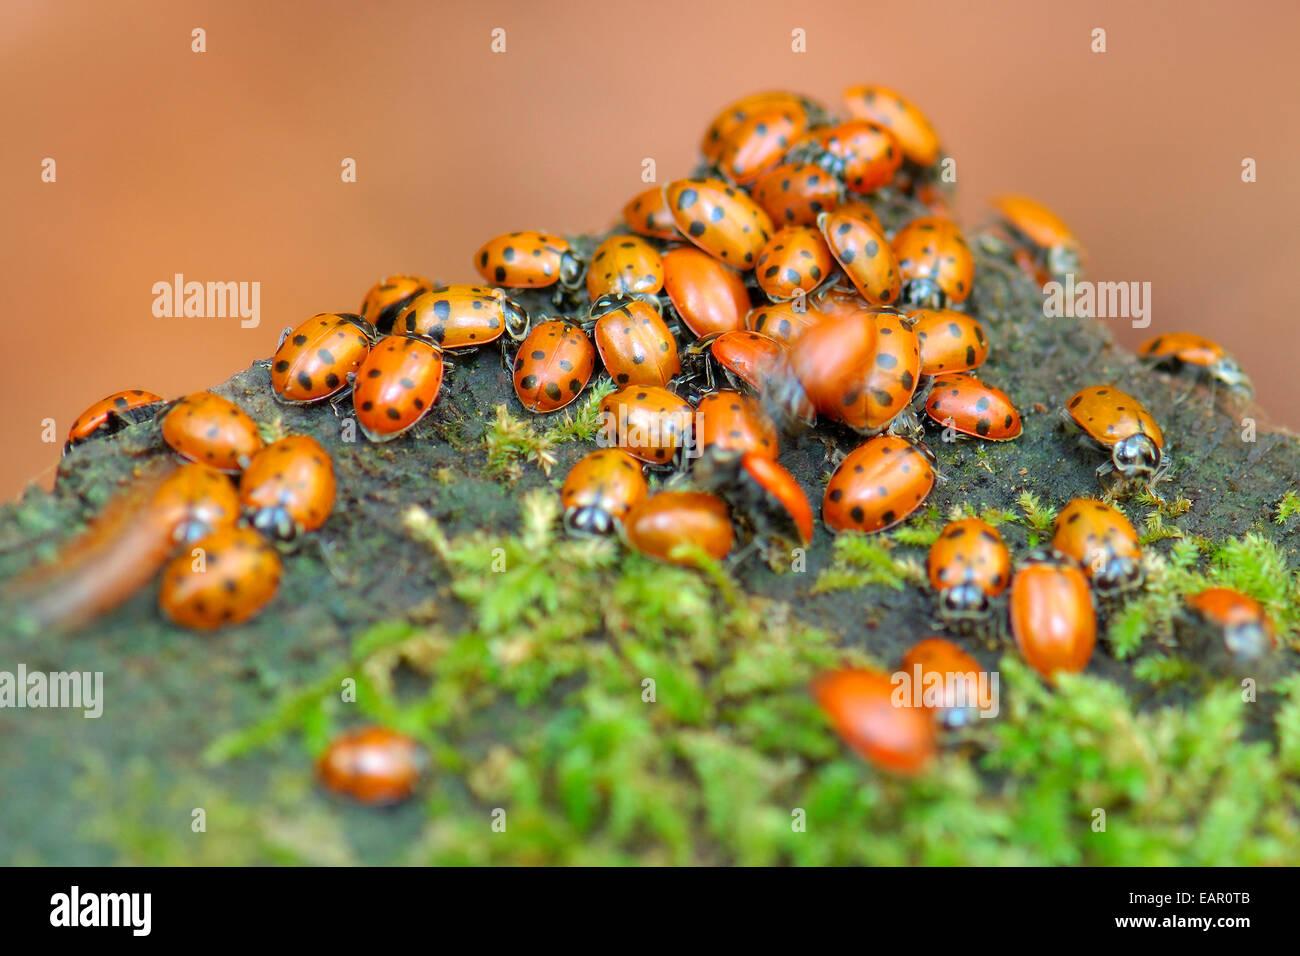 Hibernating Ladybugs, Ladybird Beetles, Muir Woods, Mill Valley, California - Stock Image